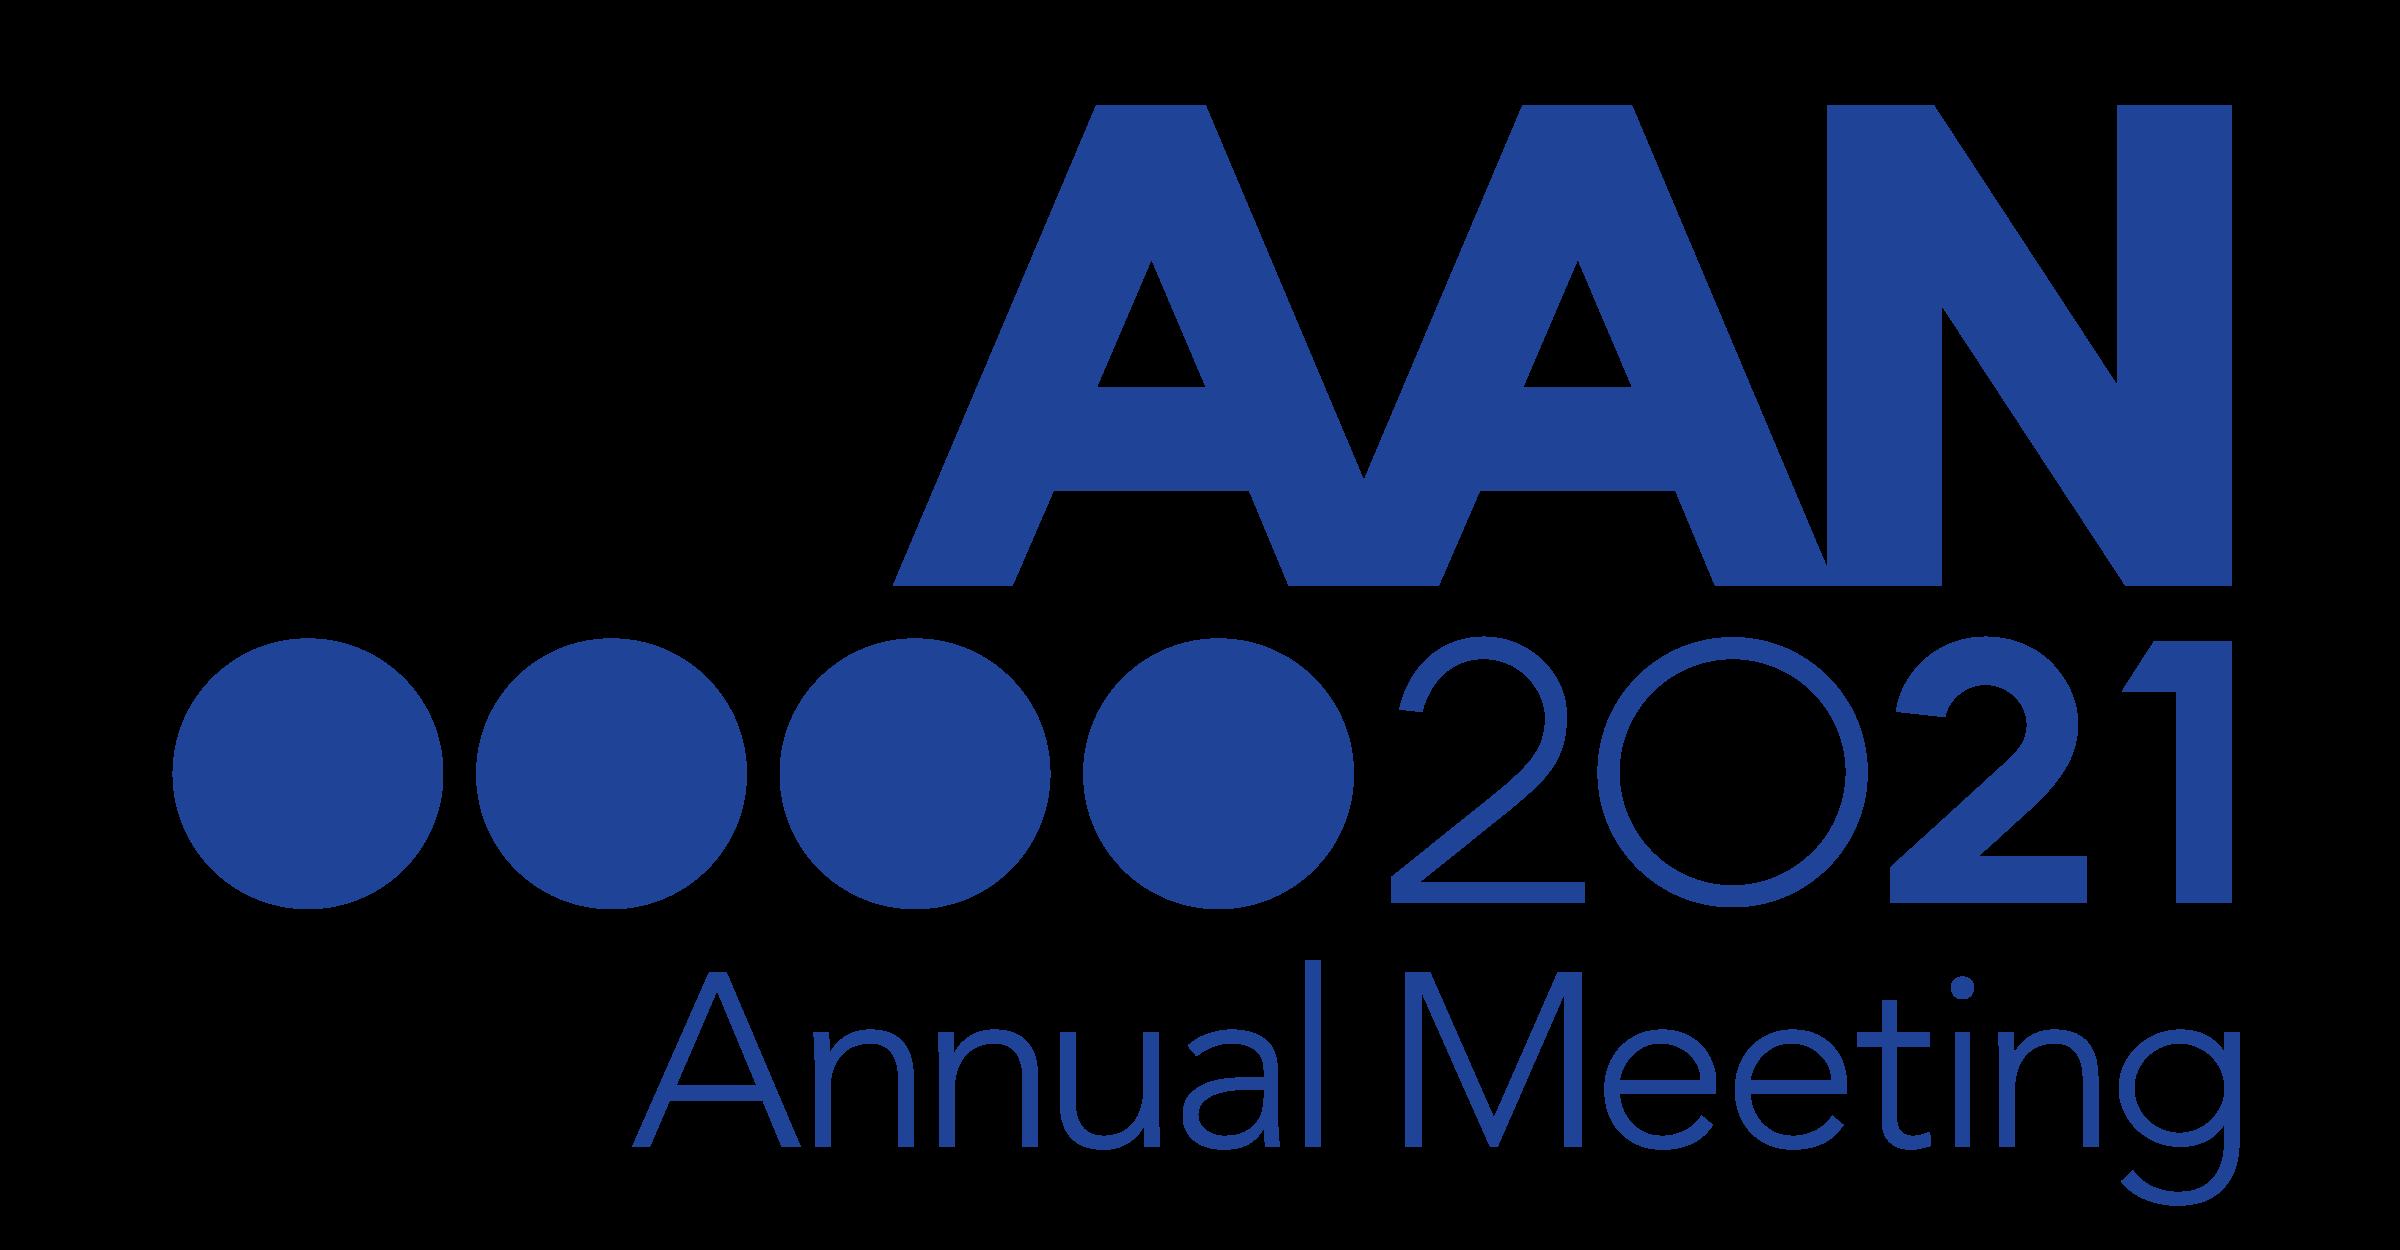 annual meeting world s premier neurology meeting aan american academy of neurology